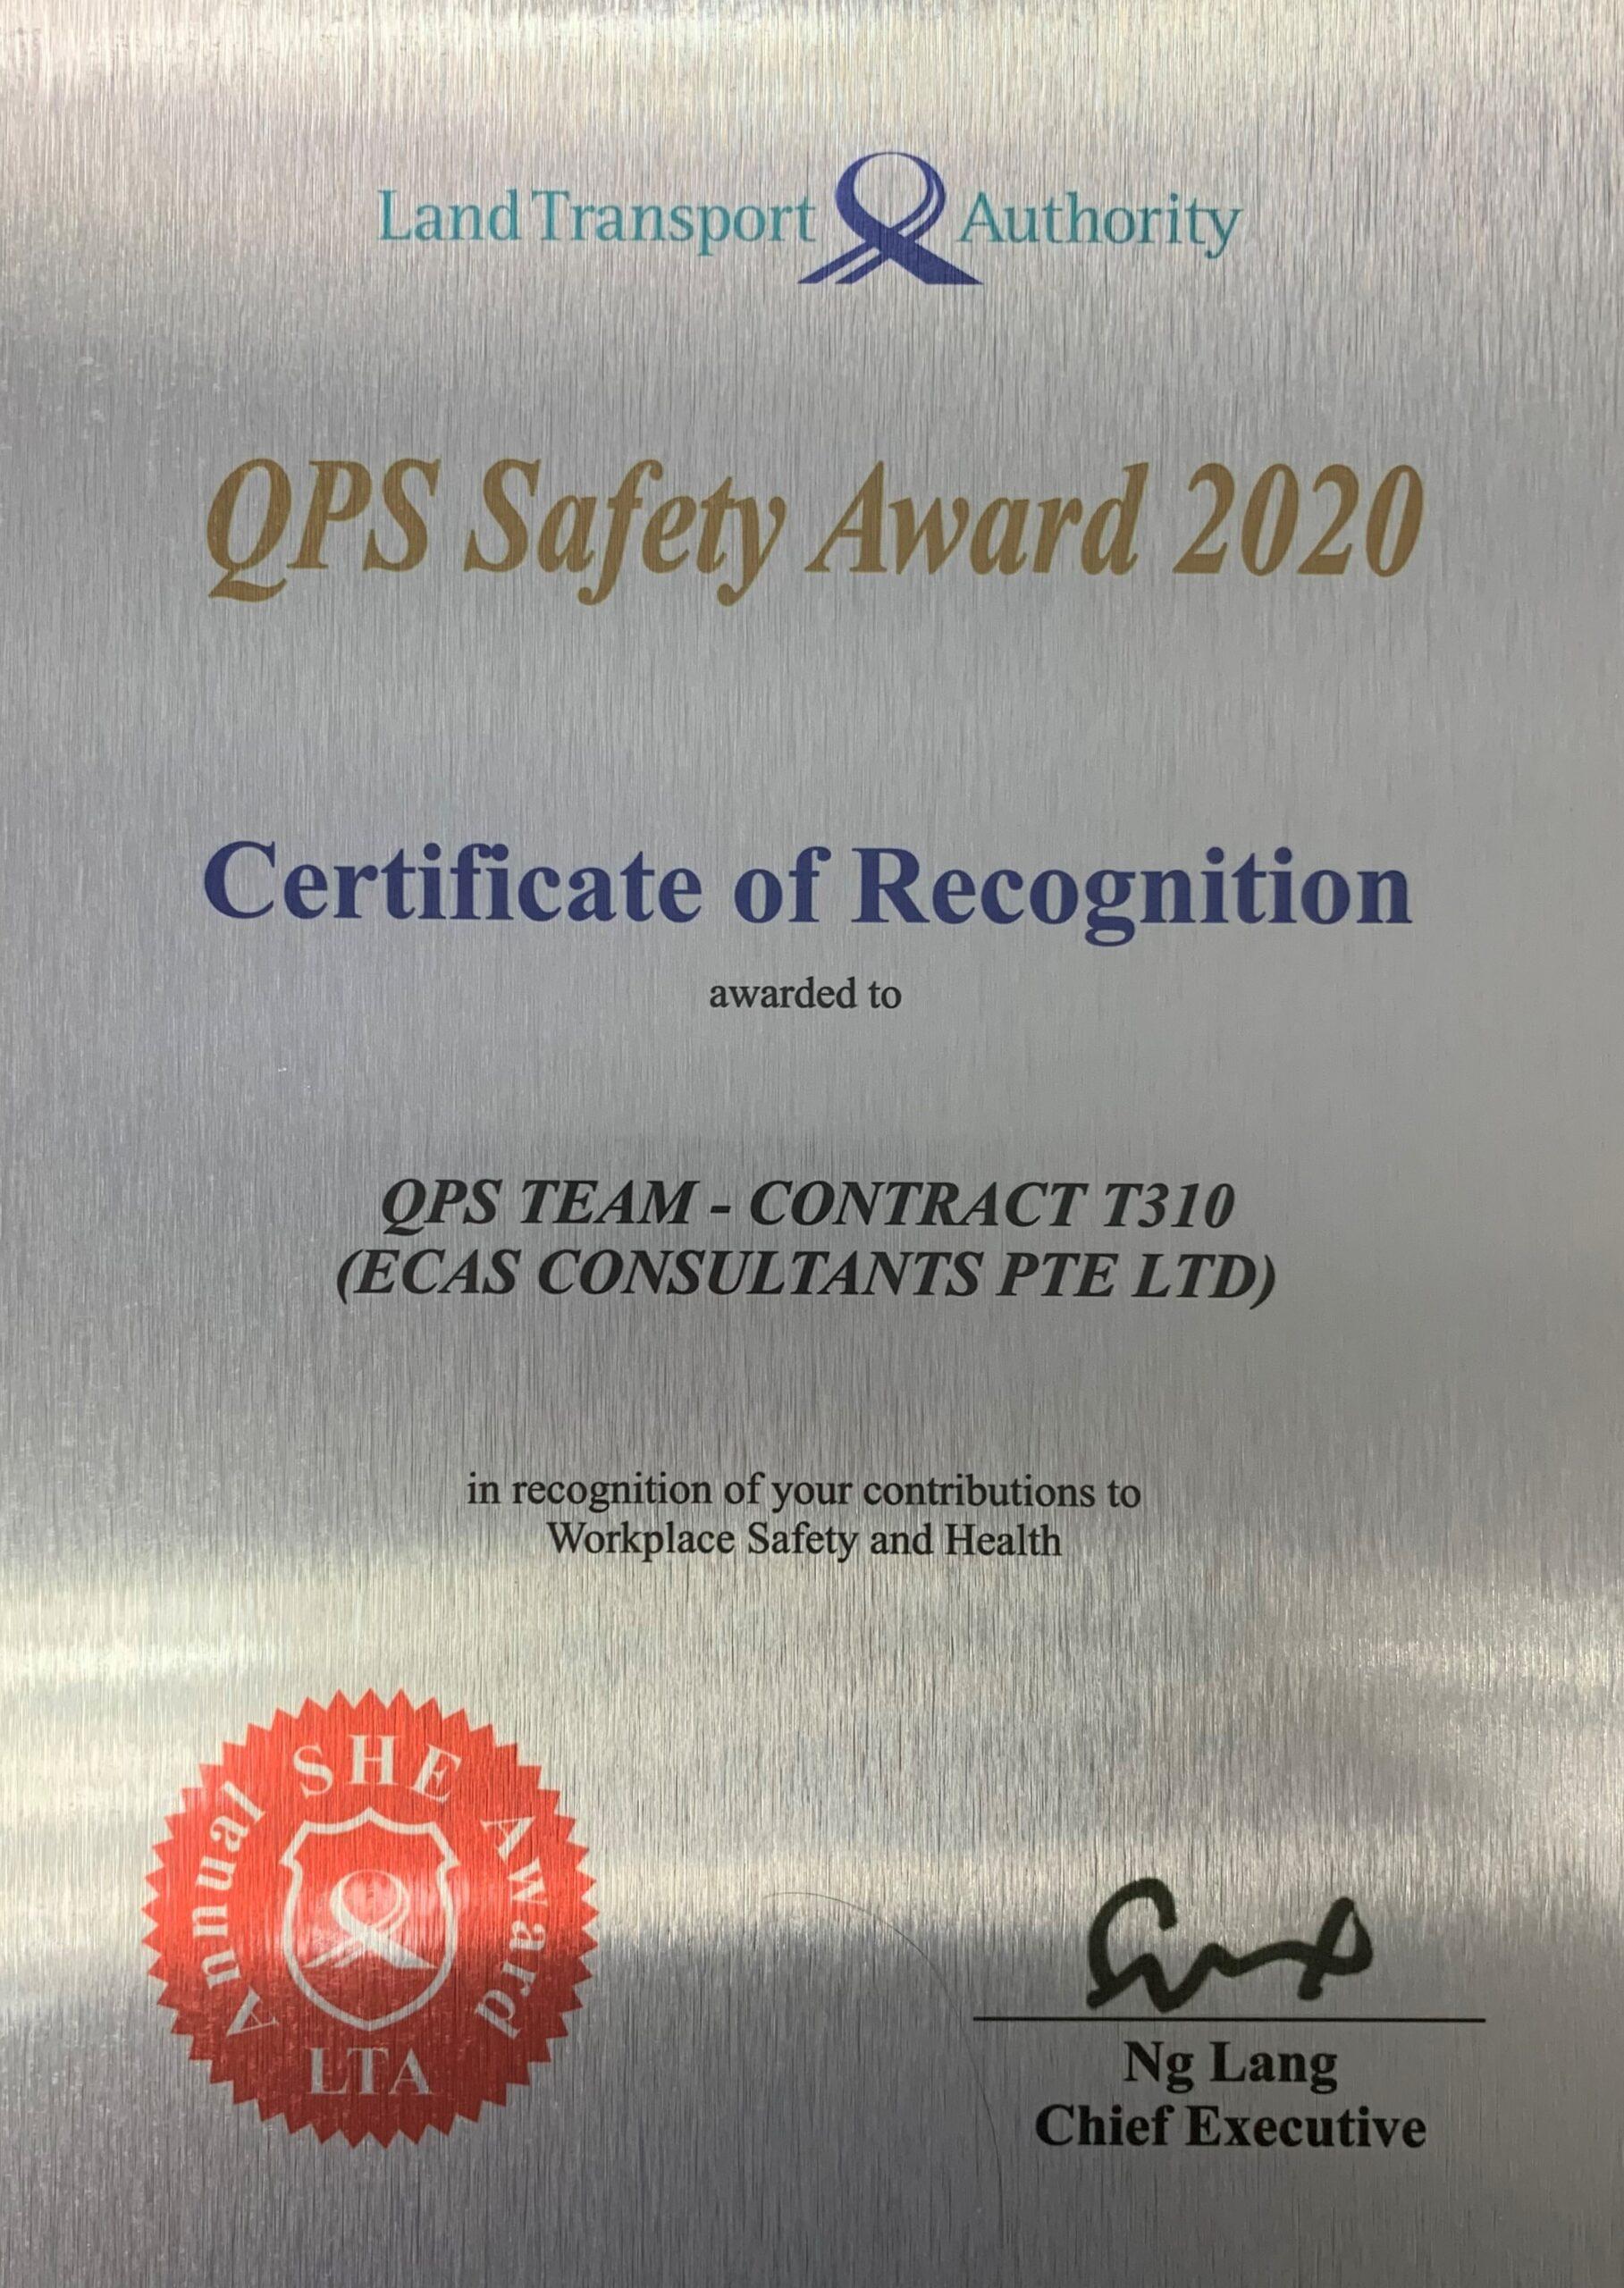 QPS Safety Award - ECAS Consultant Pte Ltd